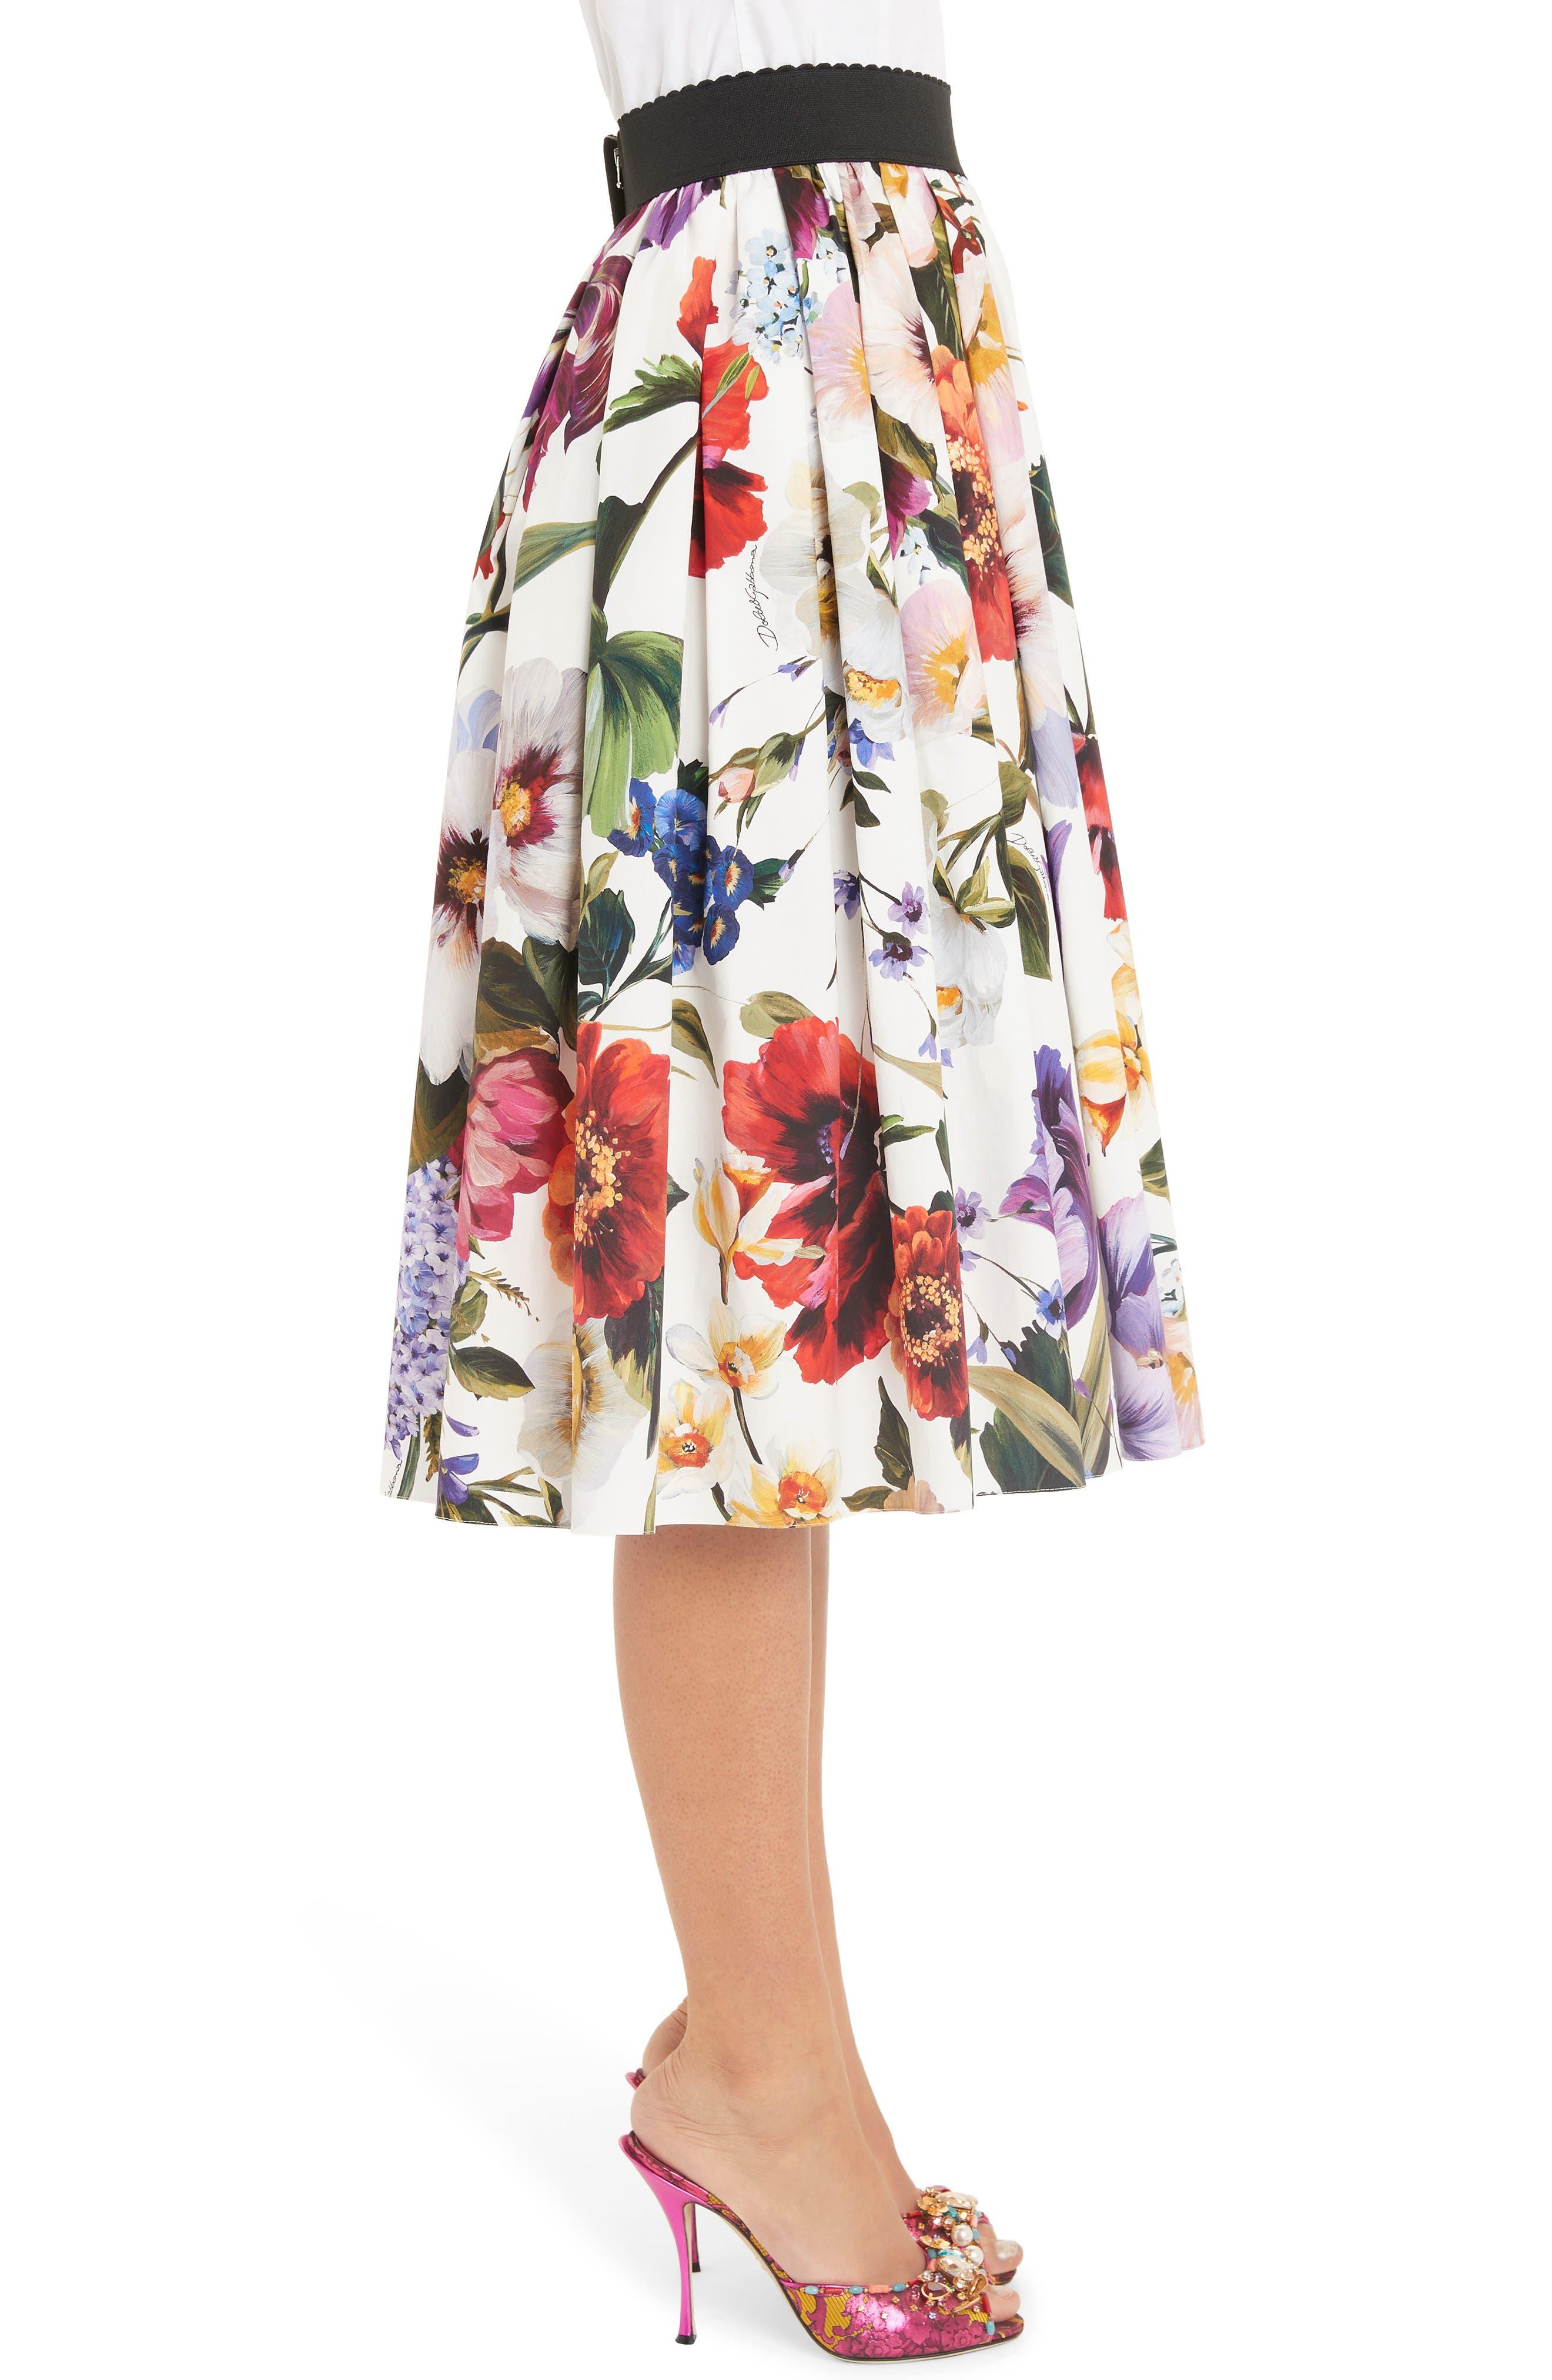 DOLCE&GABBANA, Floral Print A-Line Poplin Midi Skirt, Alternate thumbnail 3, color, PRINT